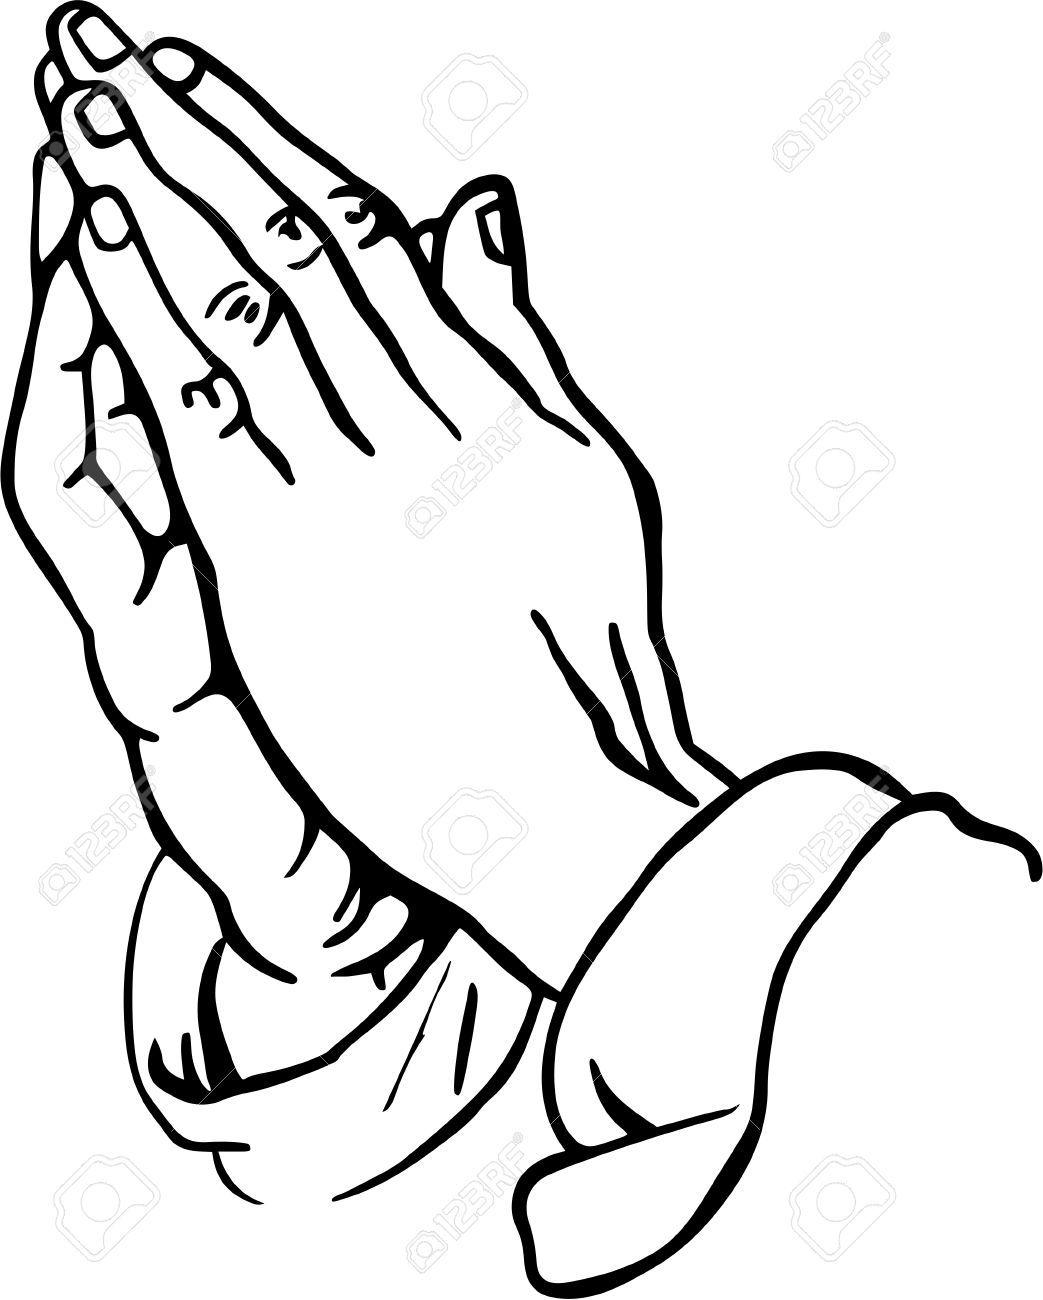 Stock photo craft ideas. Hand clipart prayer